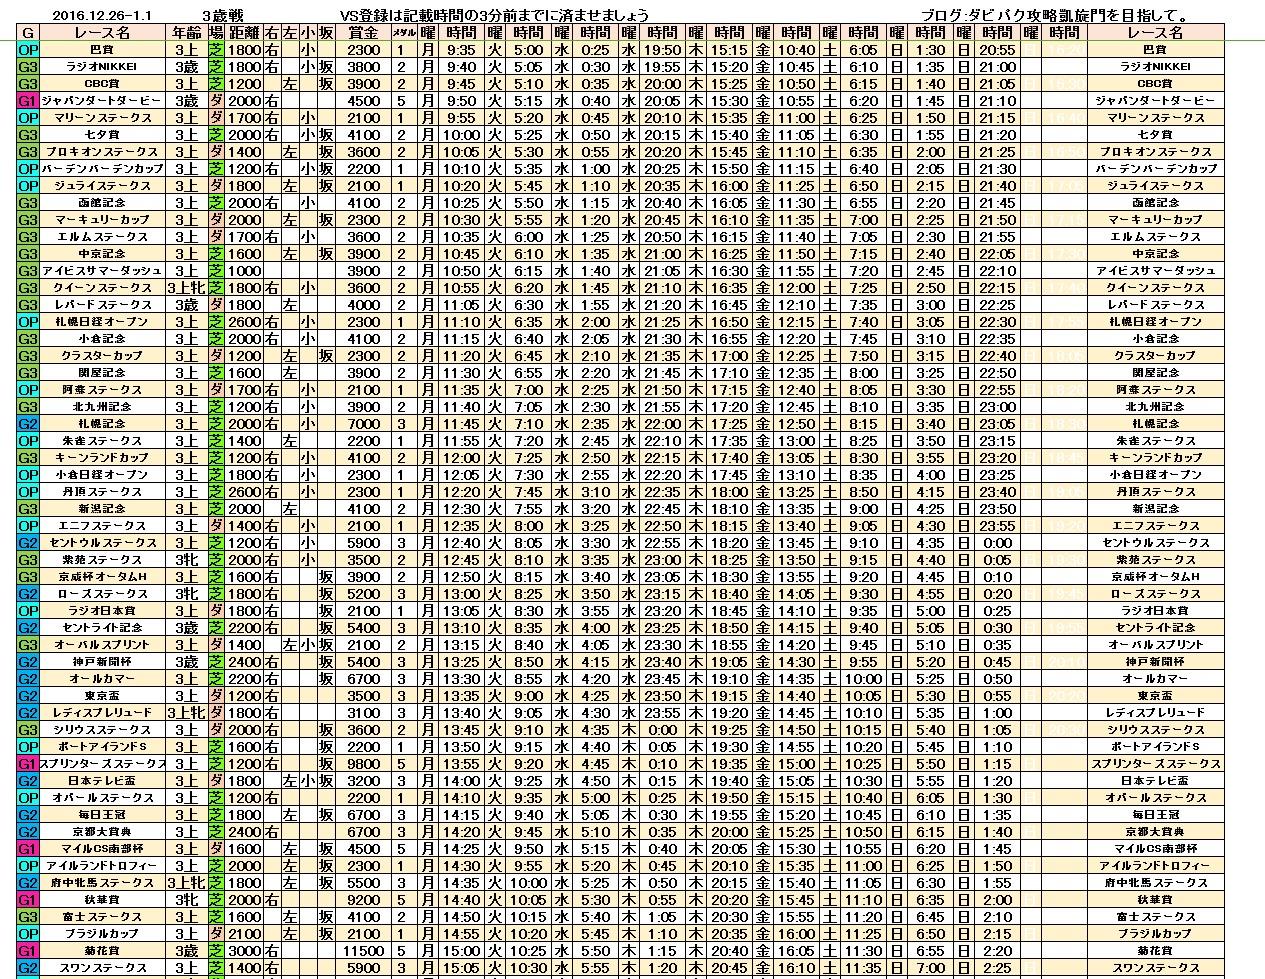 %e3%83%80%e3%83%bc%e3%83%93%e3%83%bc%e3%82%a4%e3%83%b3%e3%83%91%e3%82%af%e3%83%88vs%e3%83%ac%e3%83%bc%e3%82%b91226-5